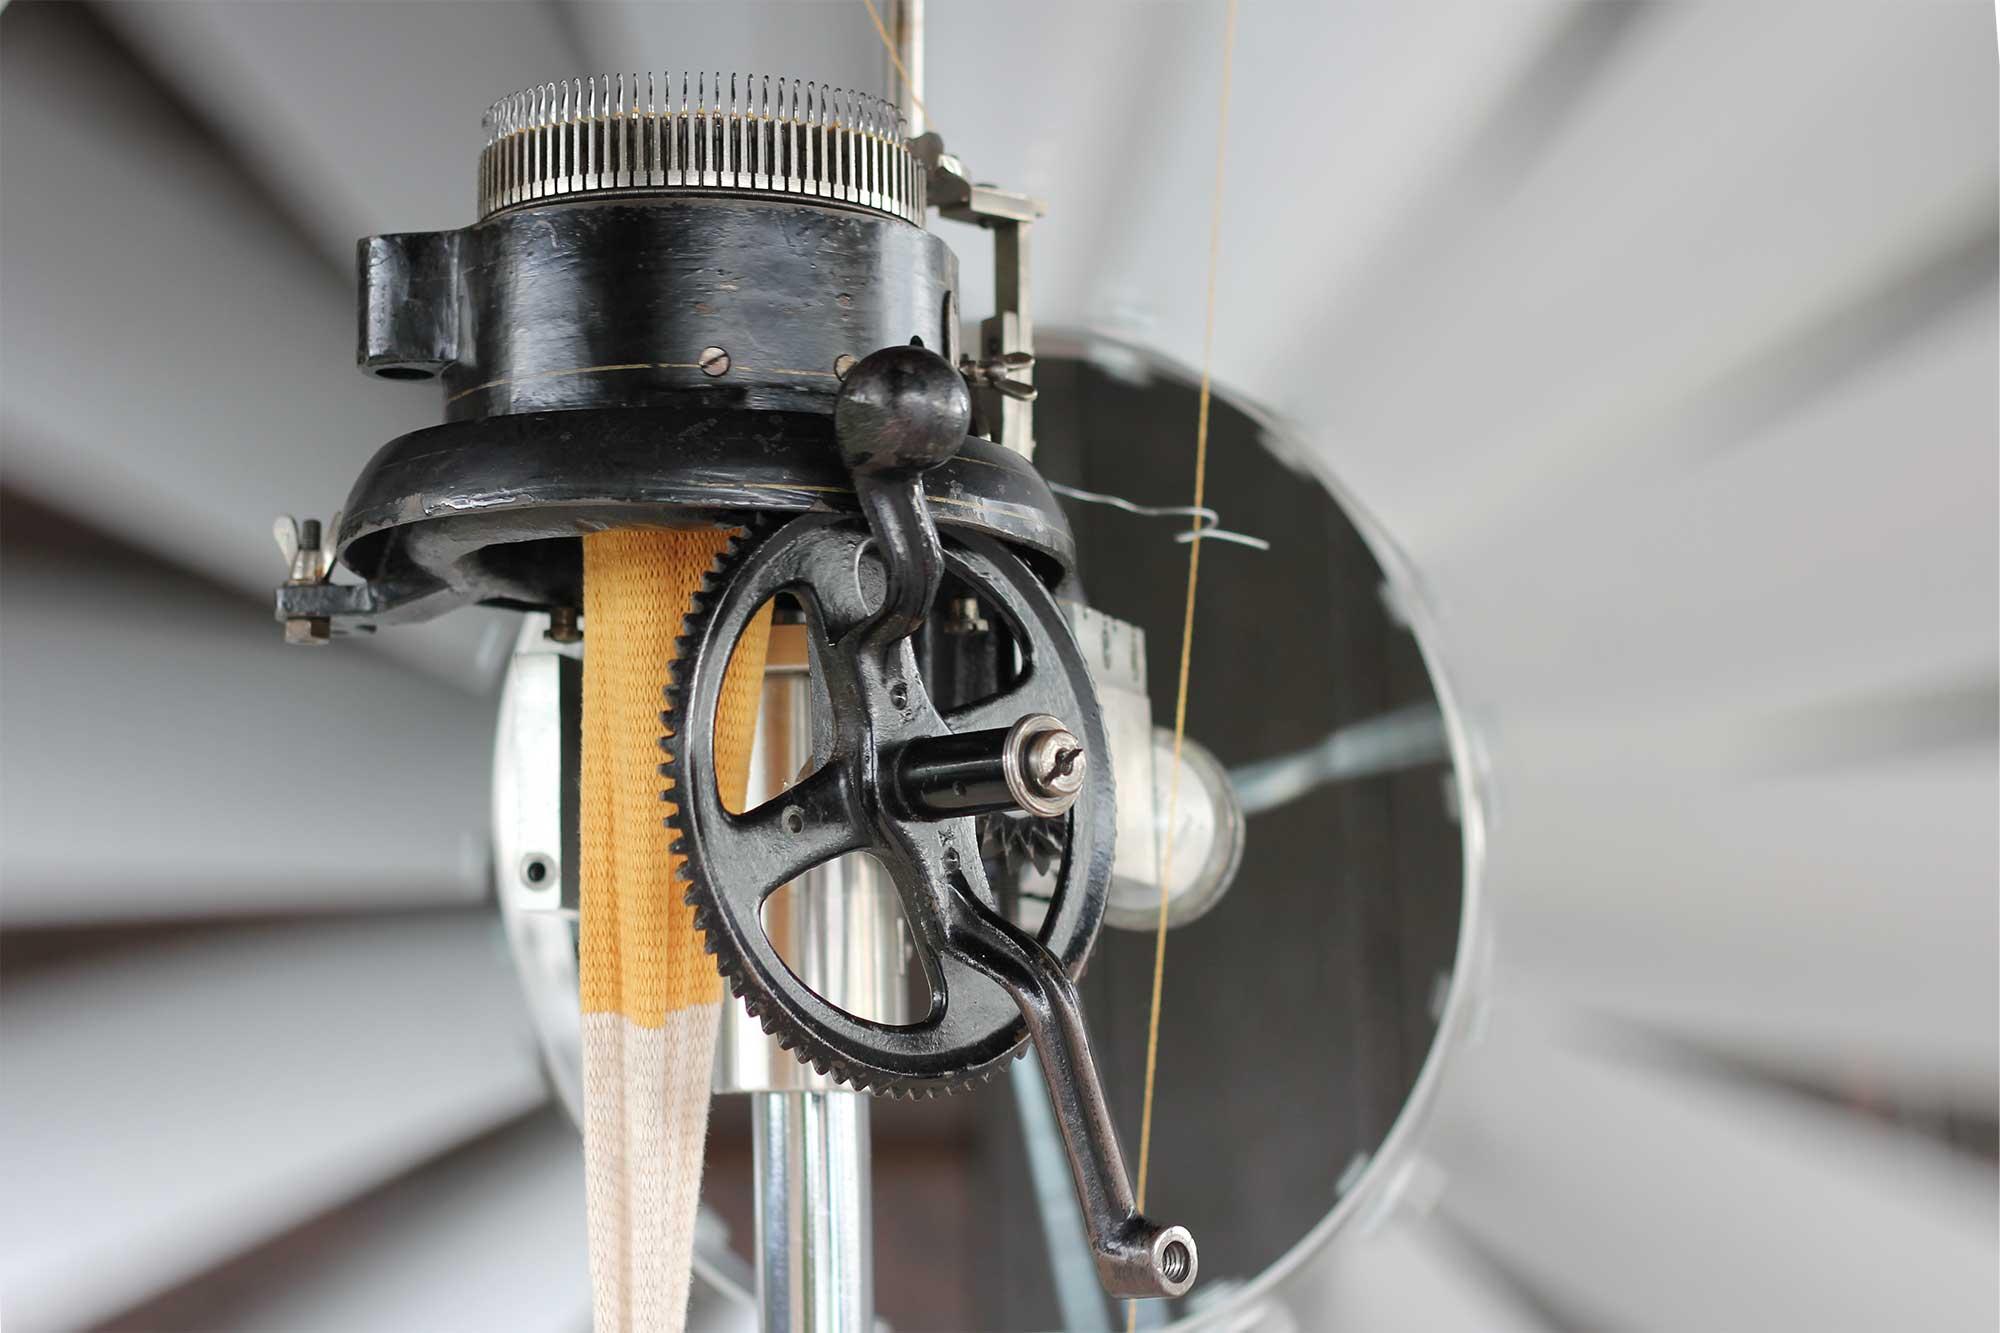 wind knitting factory merel karhof